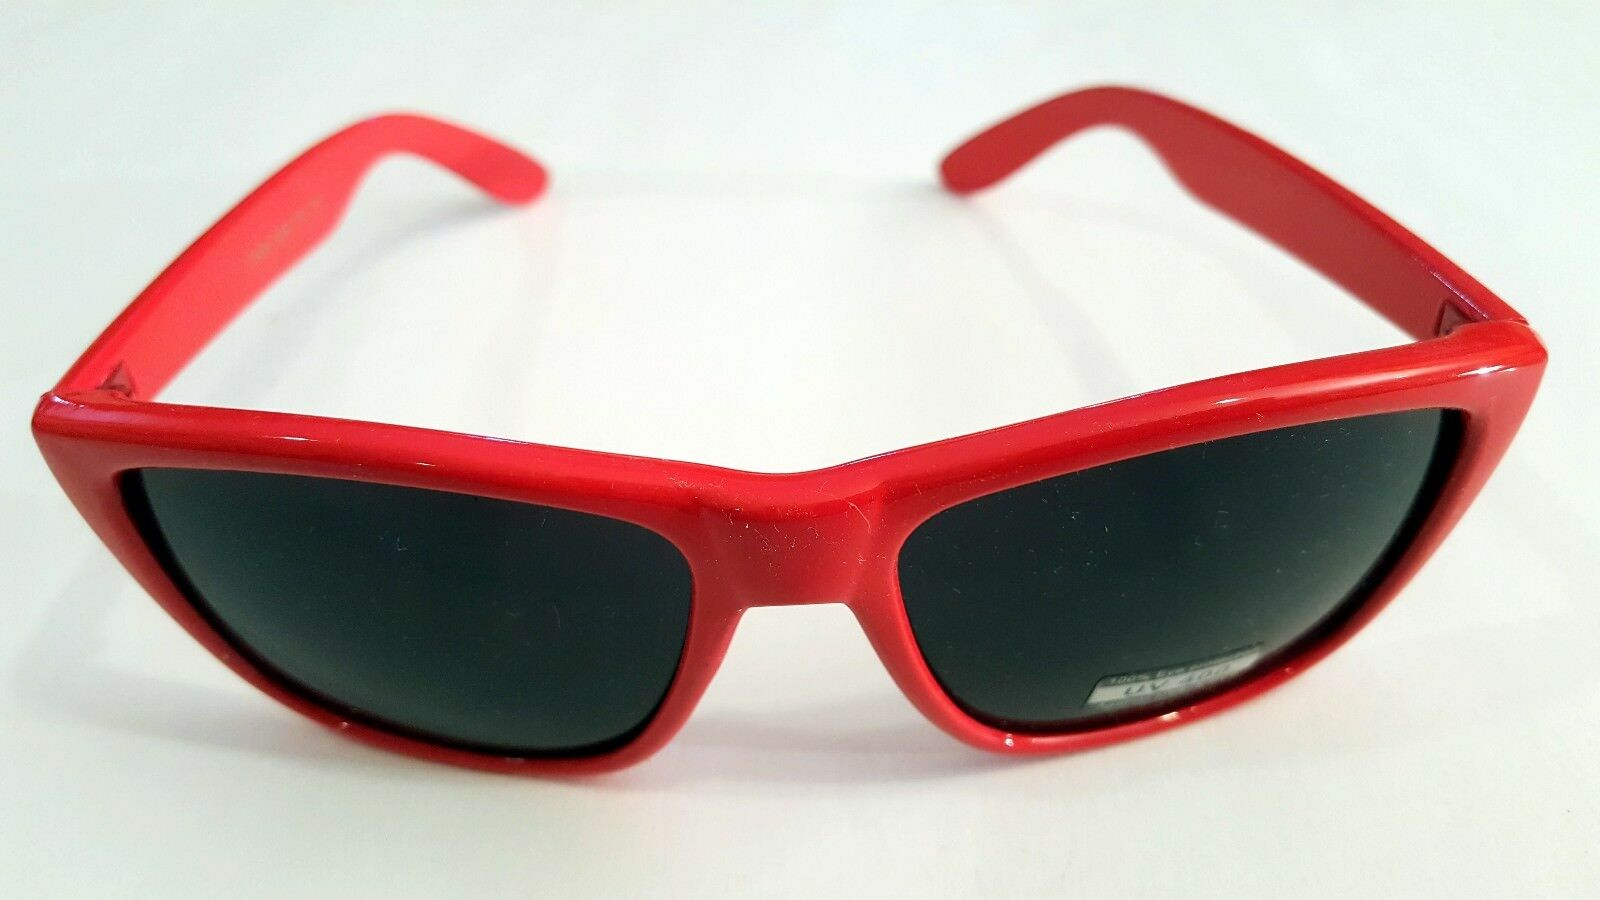 Breo Uptone Kids Childrens Navy Blue Sunglasses Full UV400 Sun Protection 100/% UVA UVB